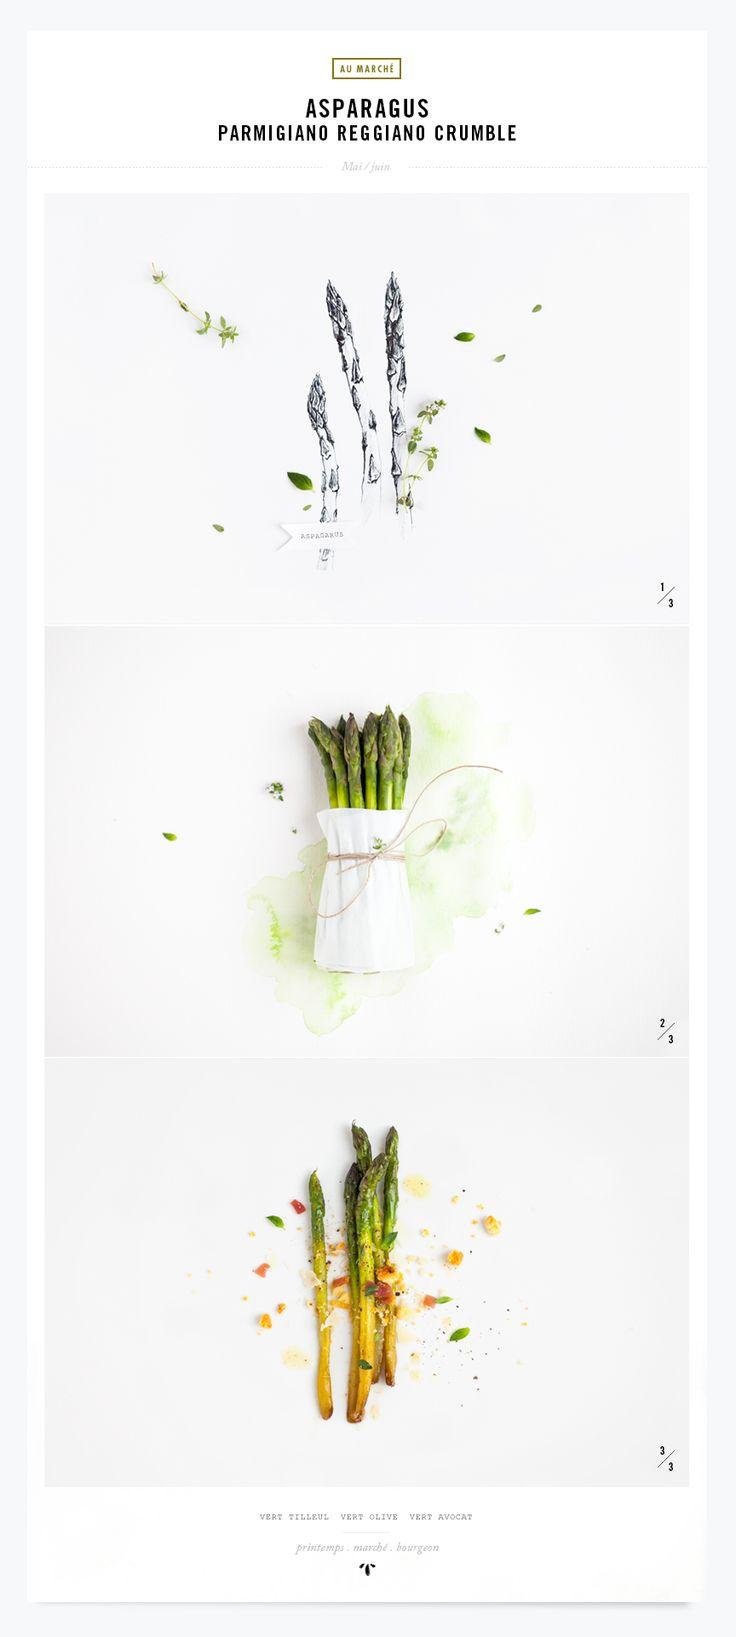 My Little Fabric - Asparagus Parmigiano Reggiano Crumble